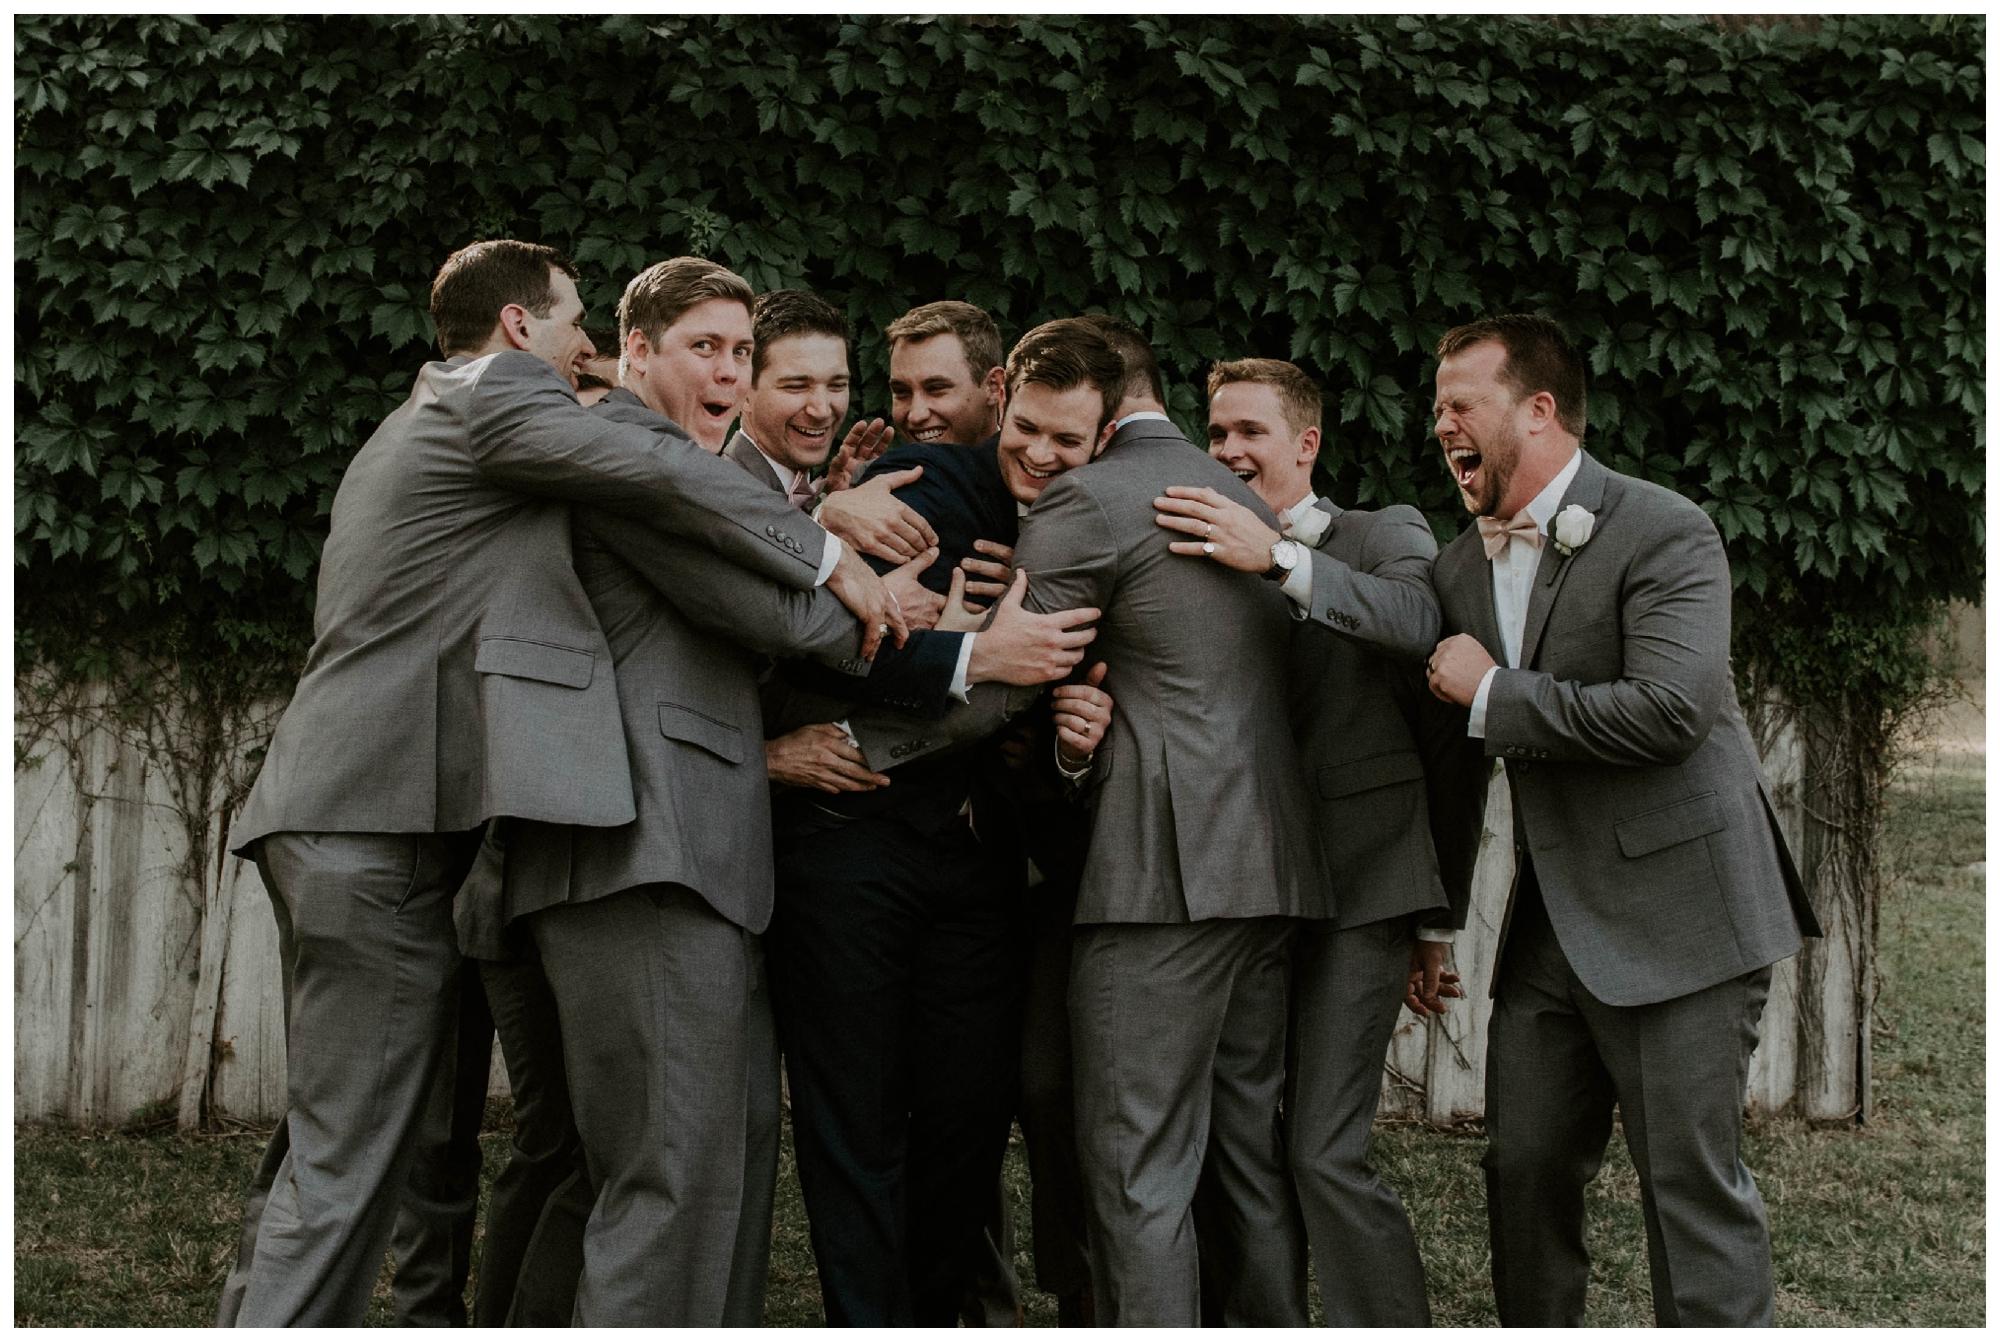 austin-texas-wedding-photography-1778-photographie_0080.jpg